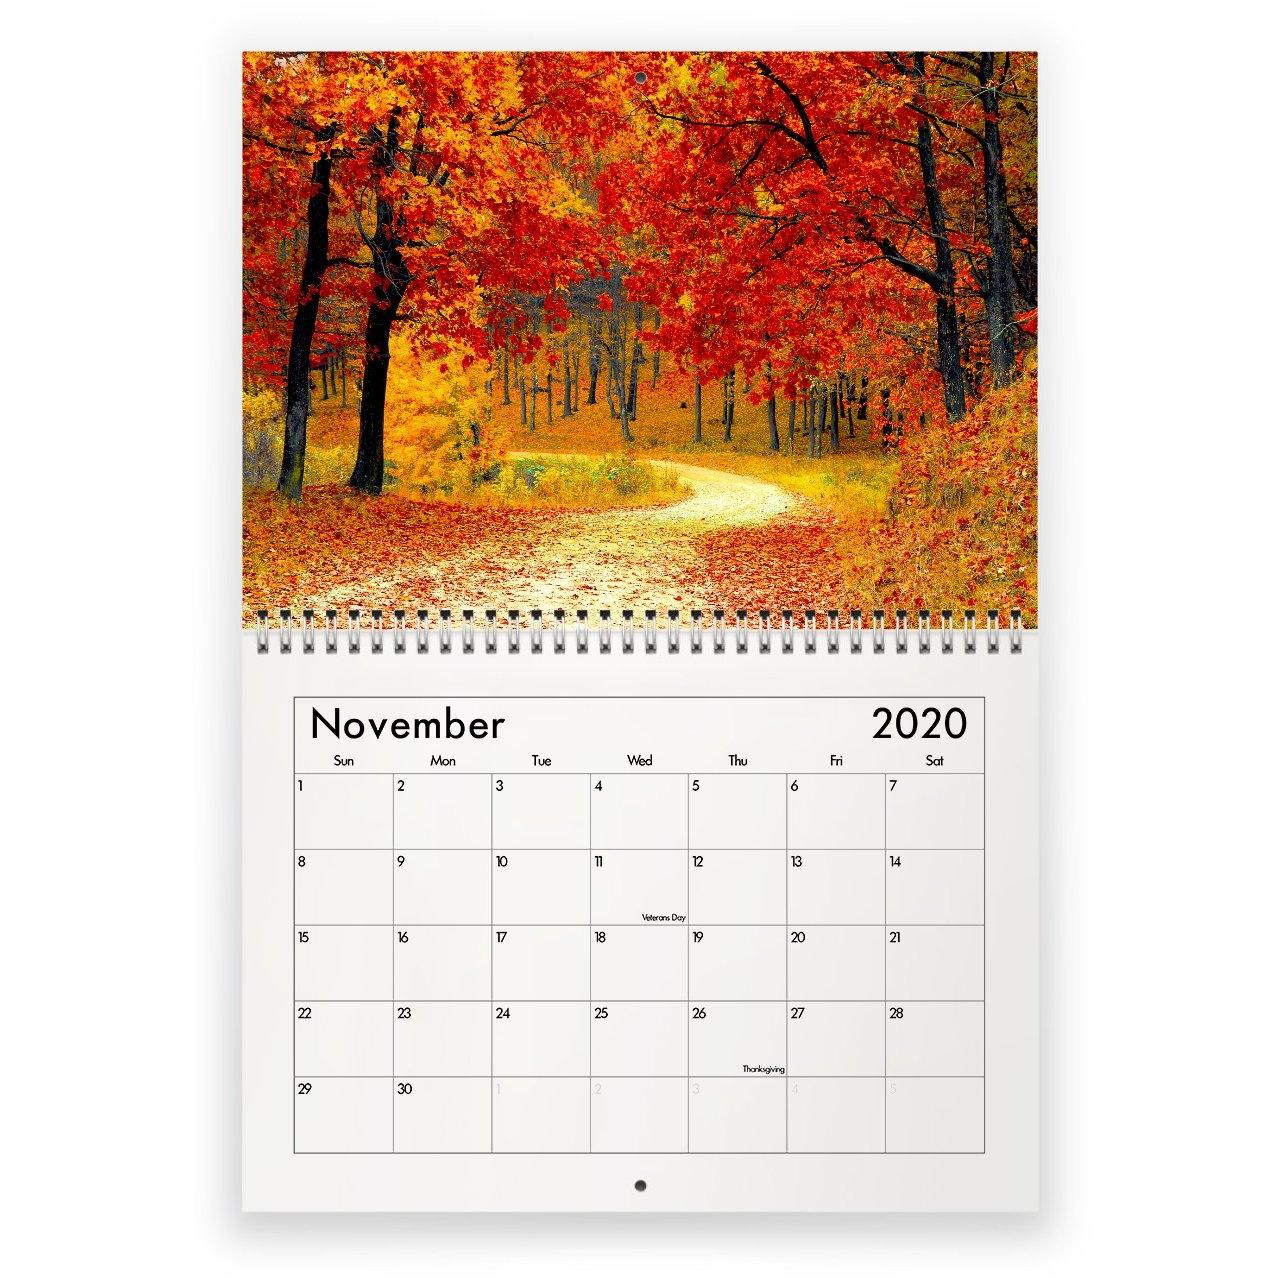 Seasons 2021 Calendar pertaining to Ilustrate Season Calendar 2021 Graphics